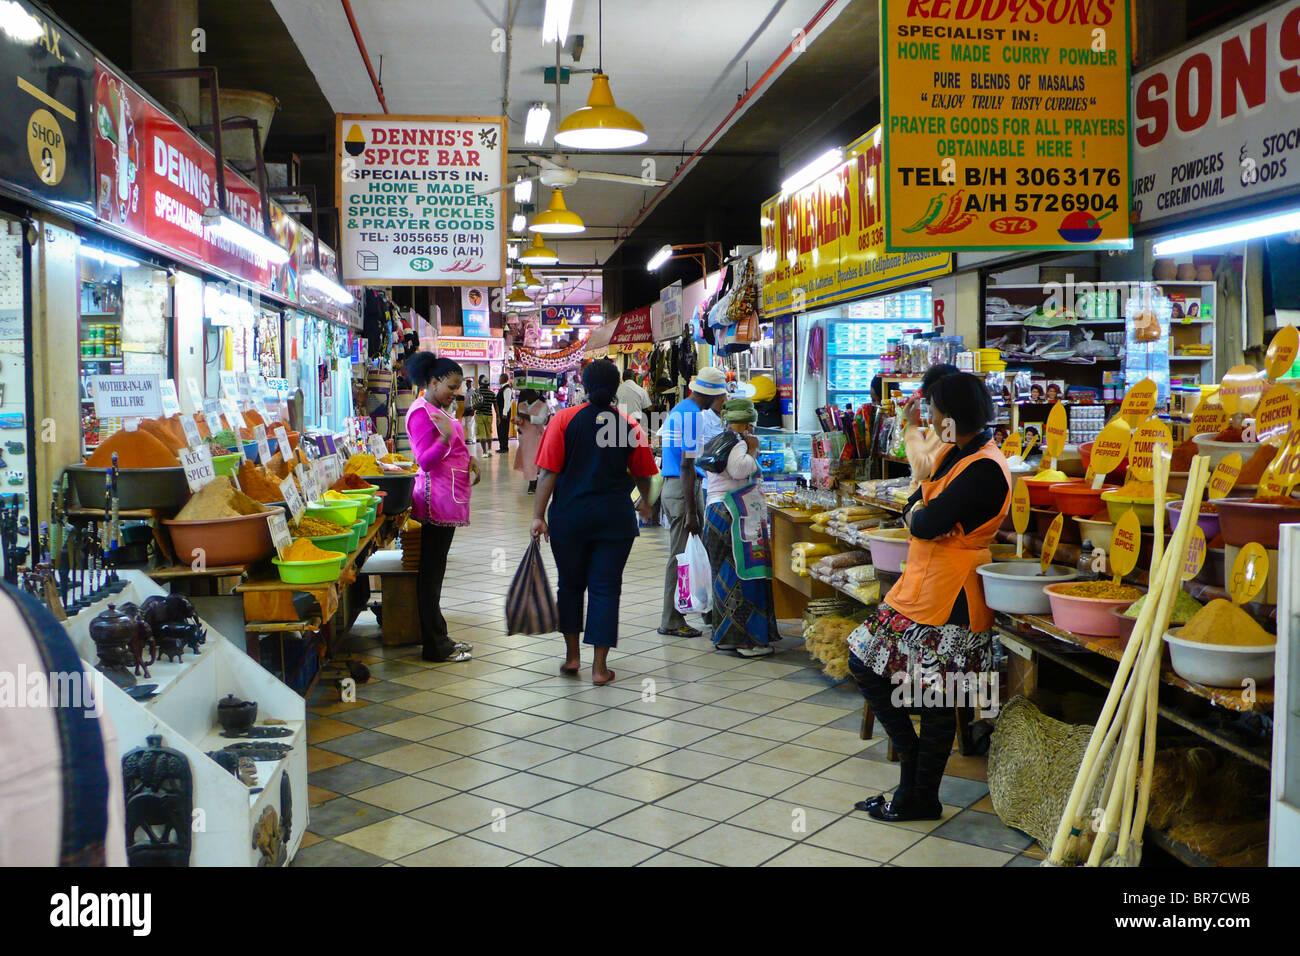 Indian Market (Victoria Street Market), Durban, South Africa - Stock Image